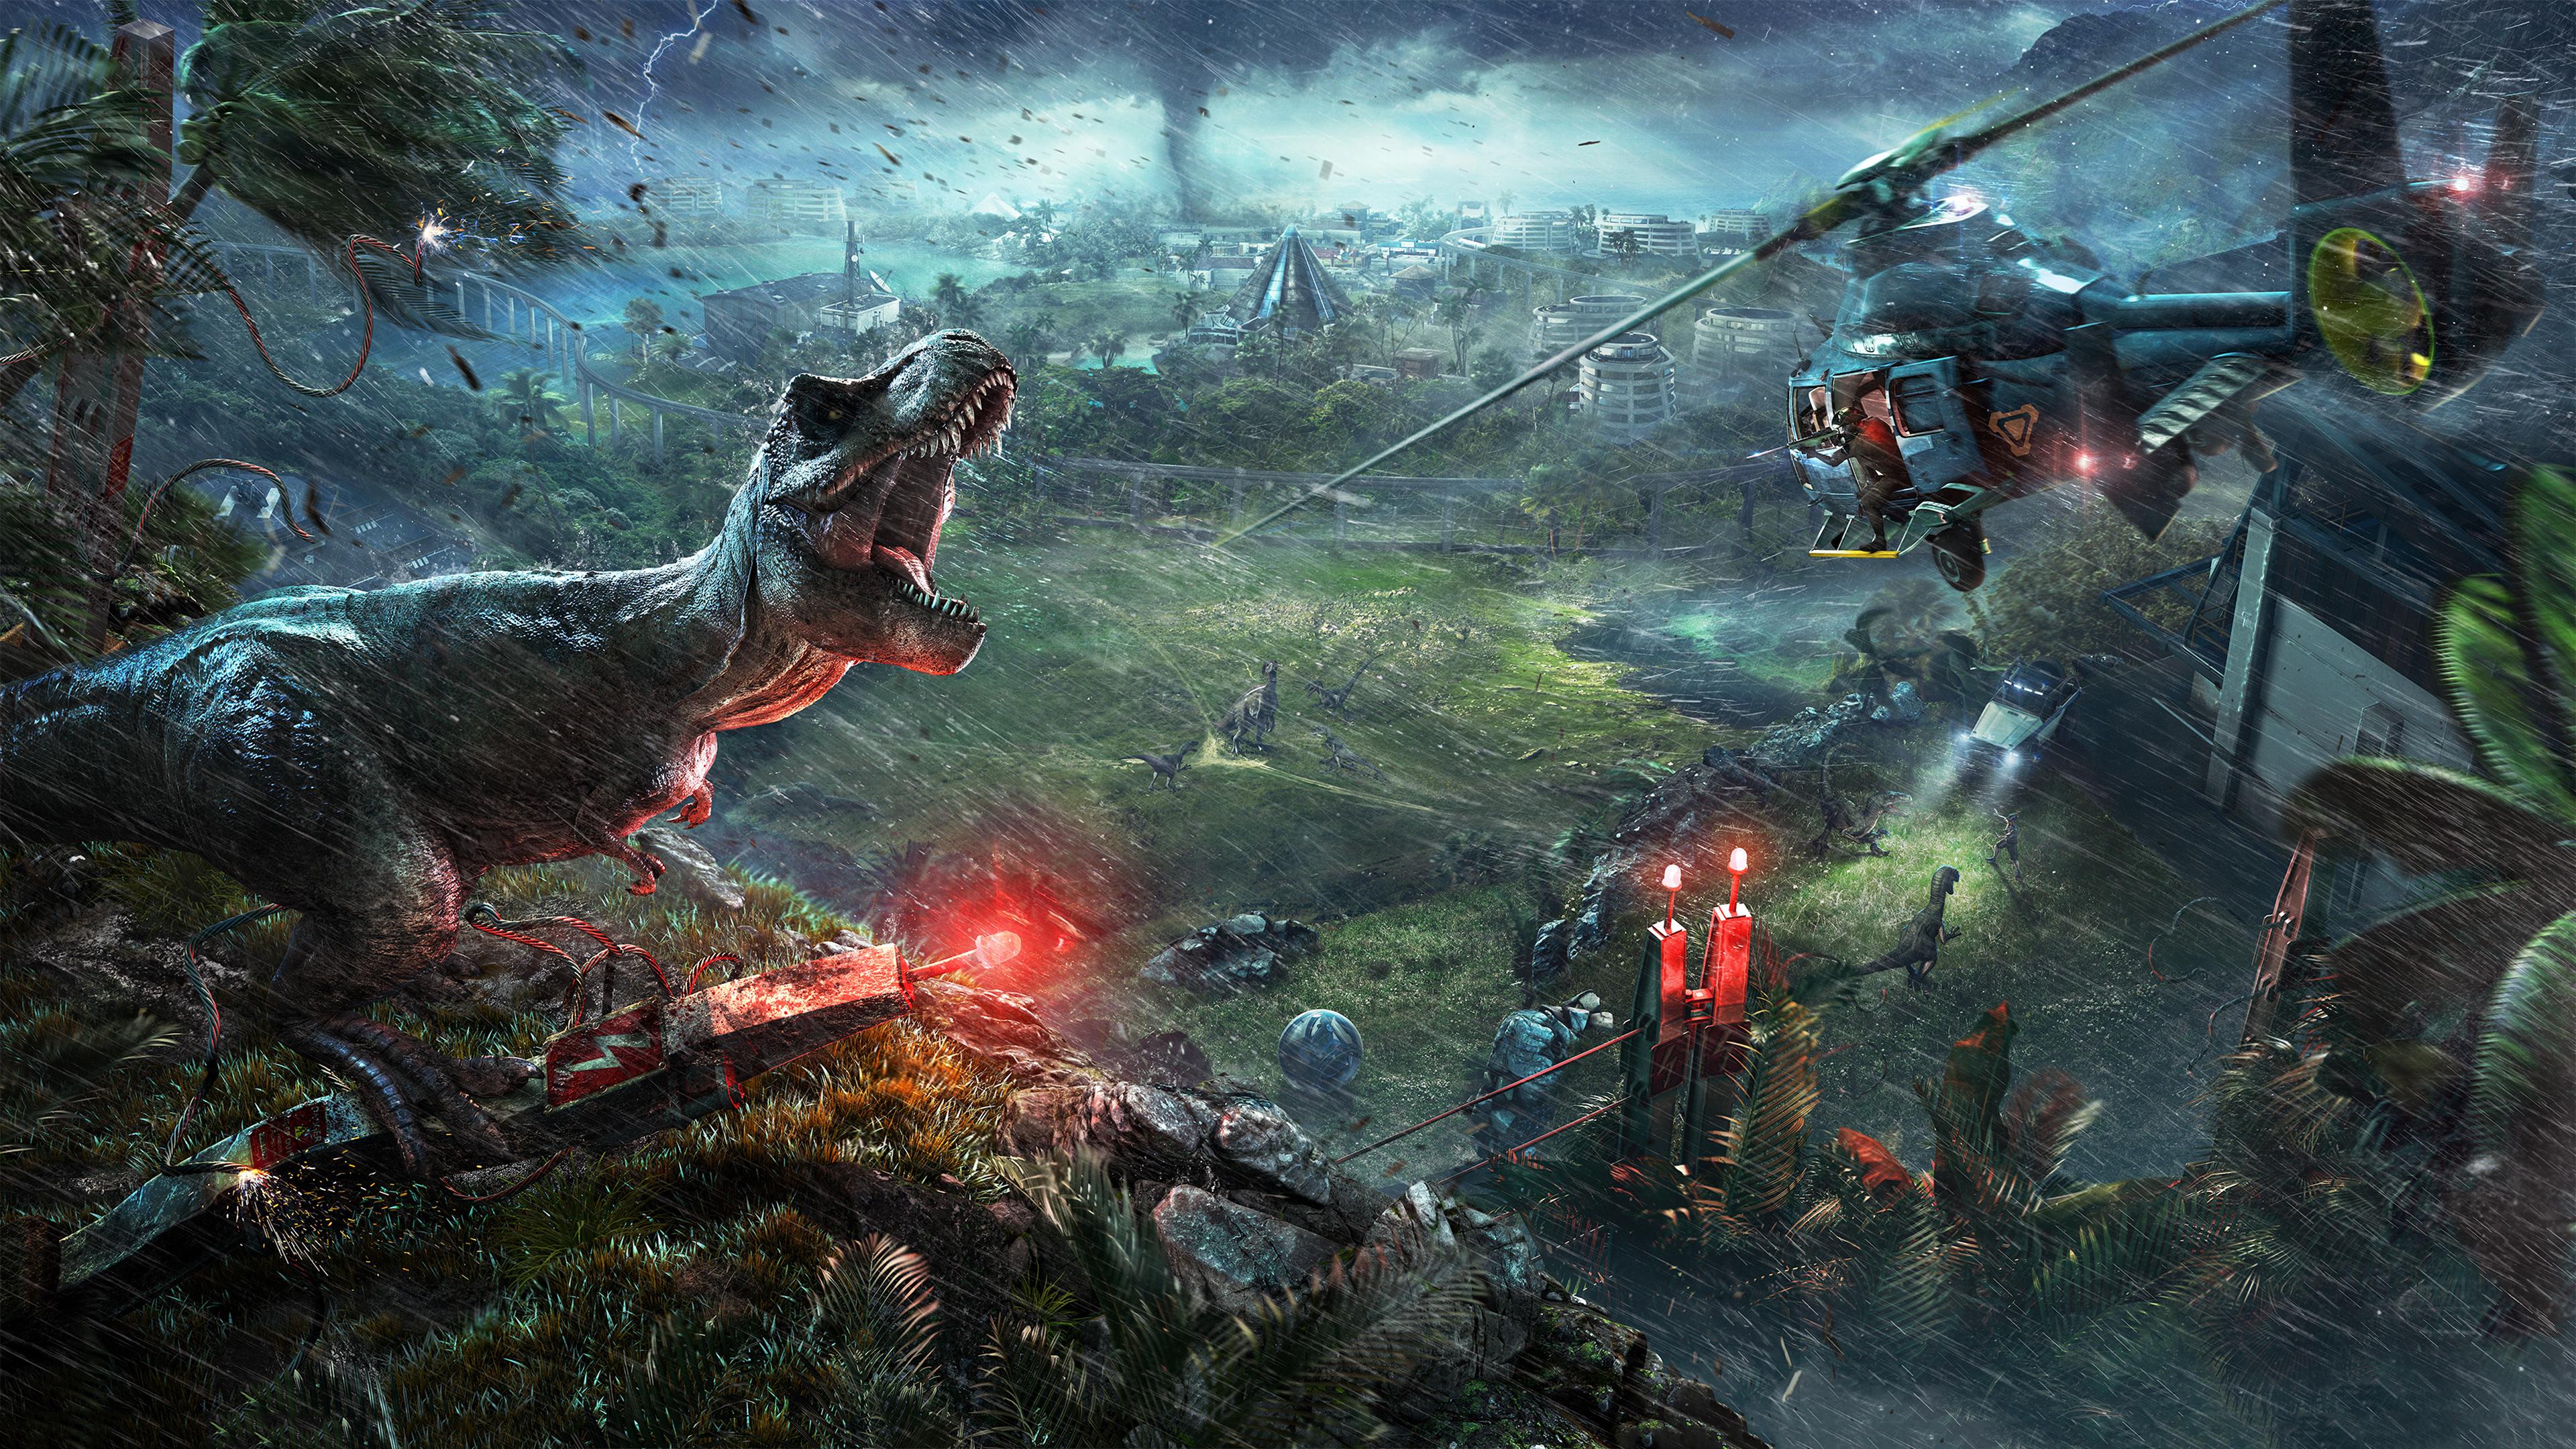 2018 Jurassic World Evolution 4k Hd Games 4k Wallpapers